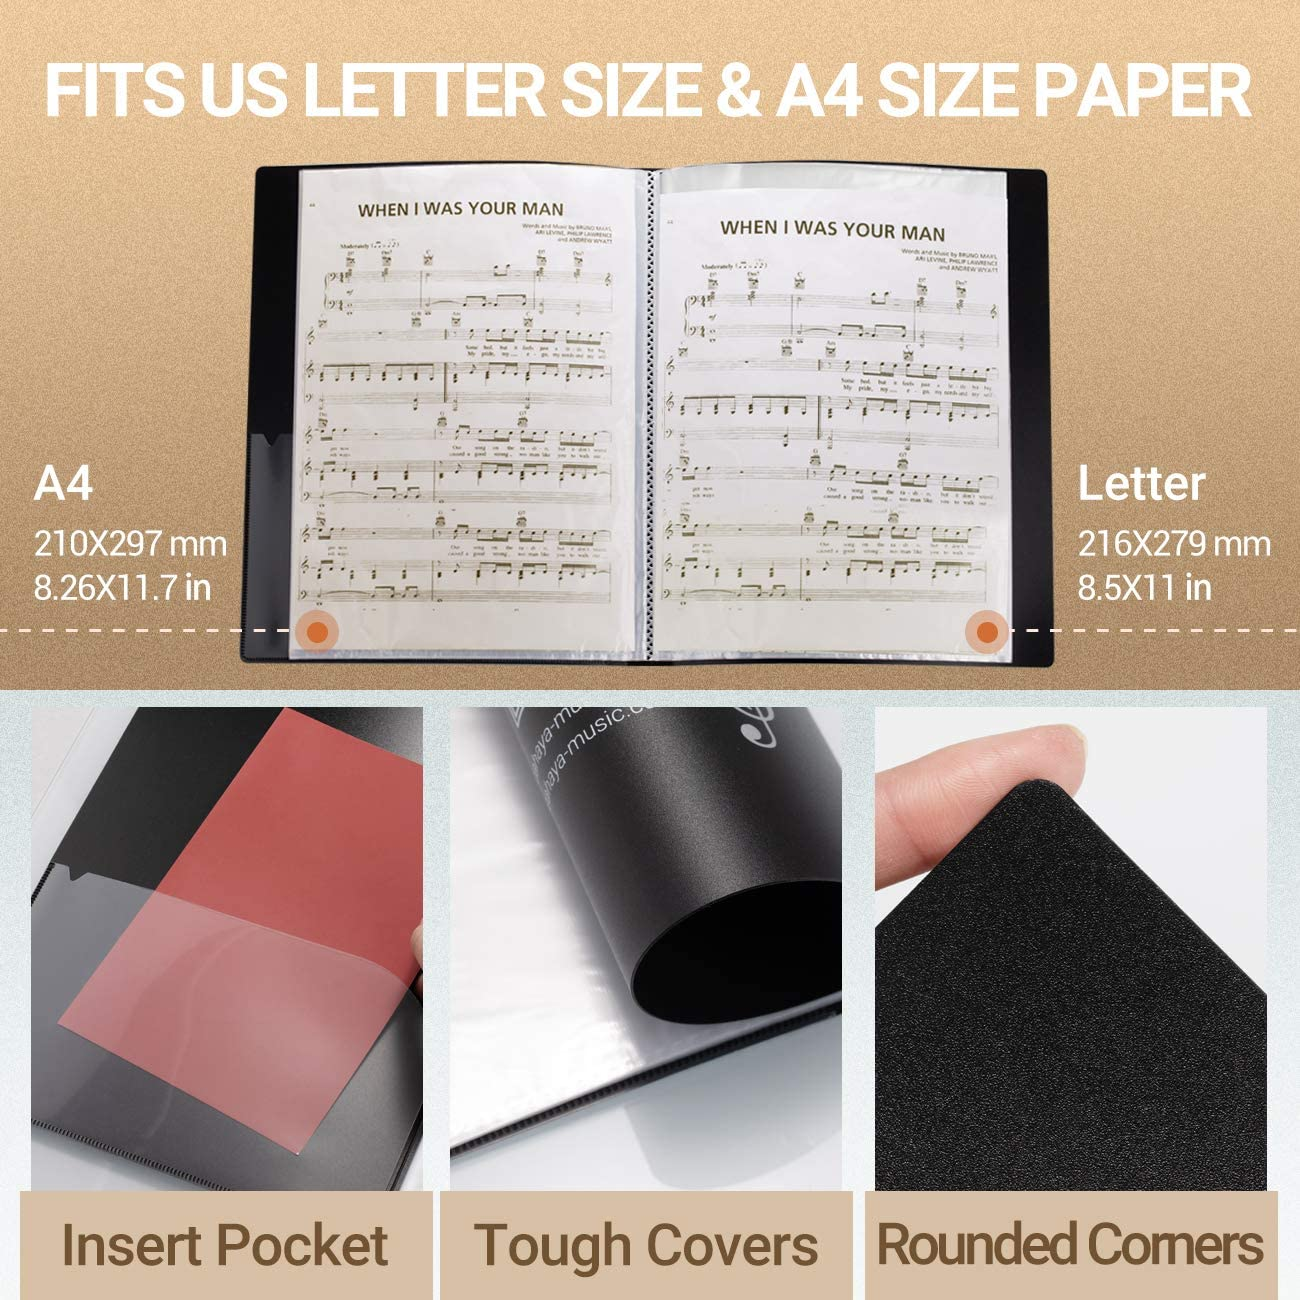 CAHAYA Sheet Music Folder Documents File Paper Storage Blank Sheet Organizer US Letter Size A4 Size 40 Pockets